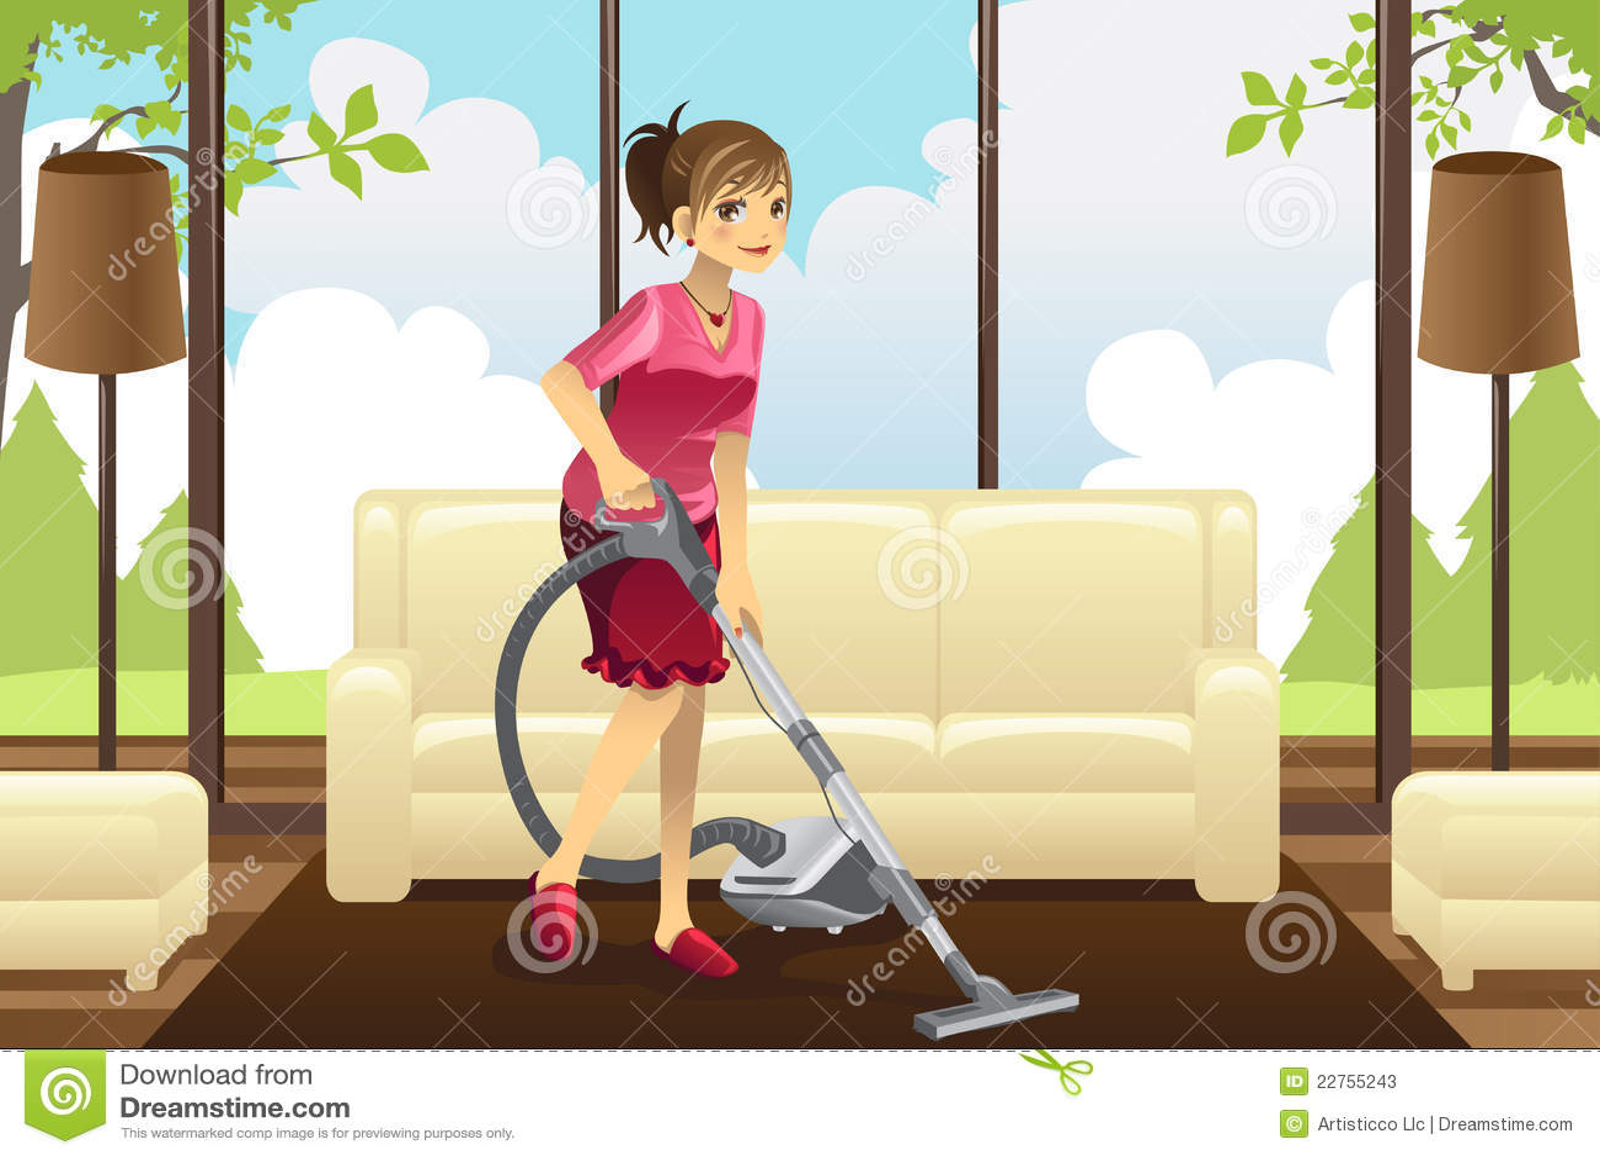 Limpiar alfombras en casa elegant aspirar alfombras with - Limpiar alfombra en casa ...